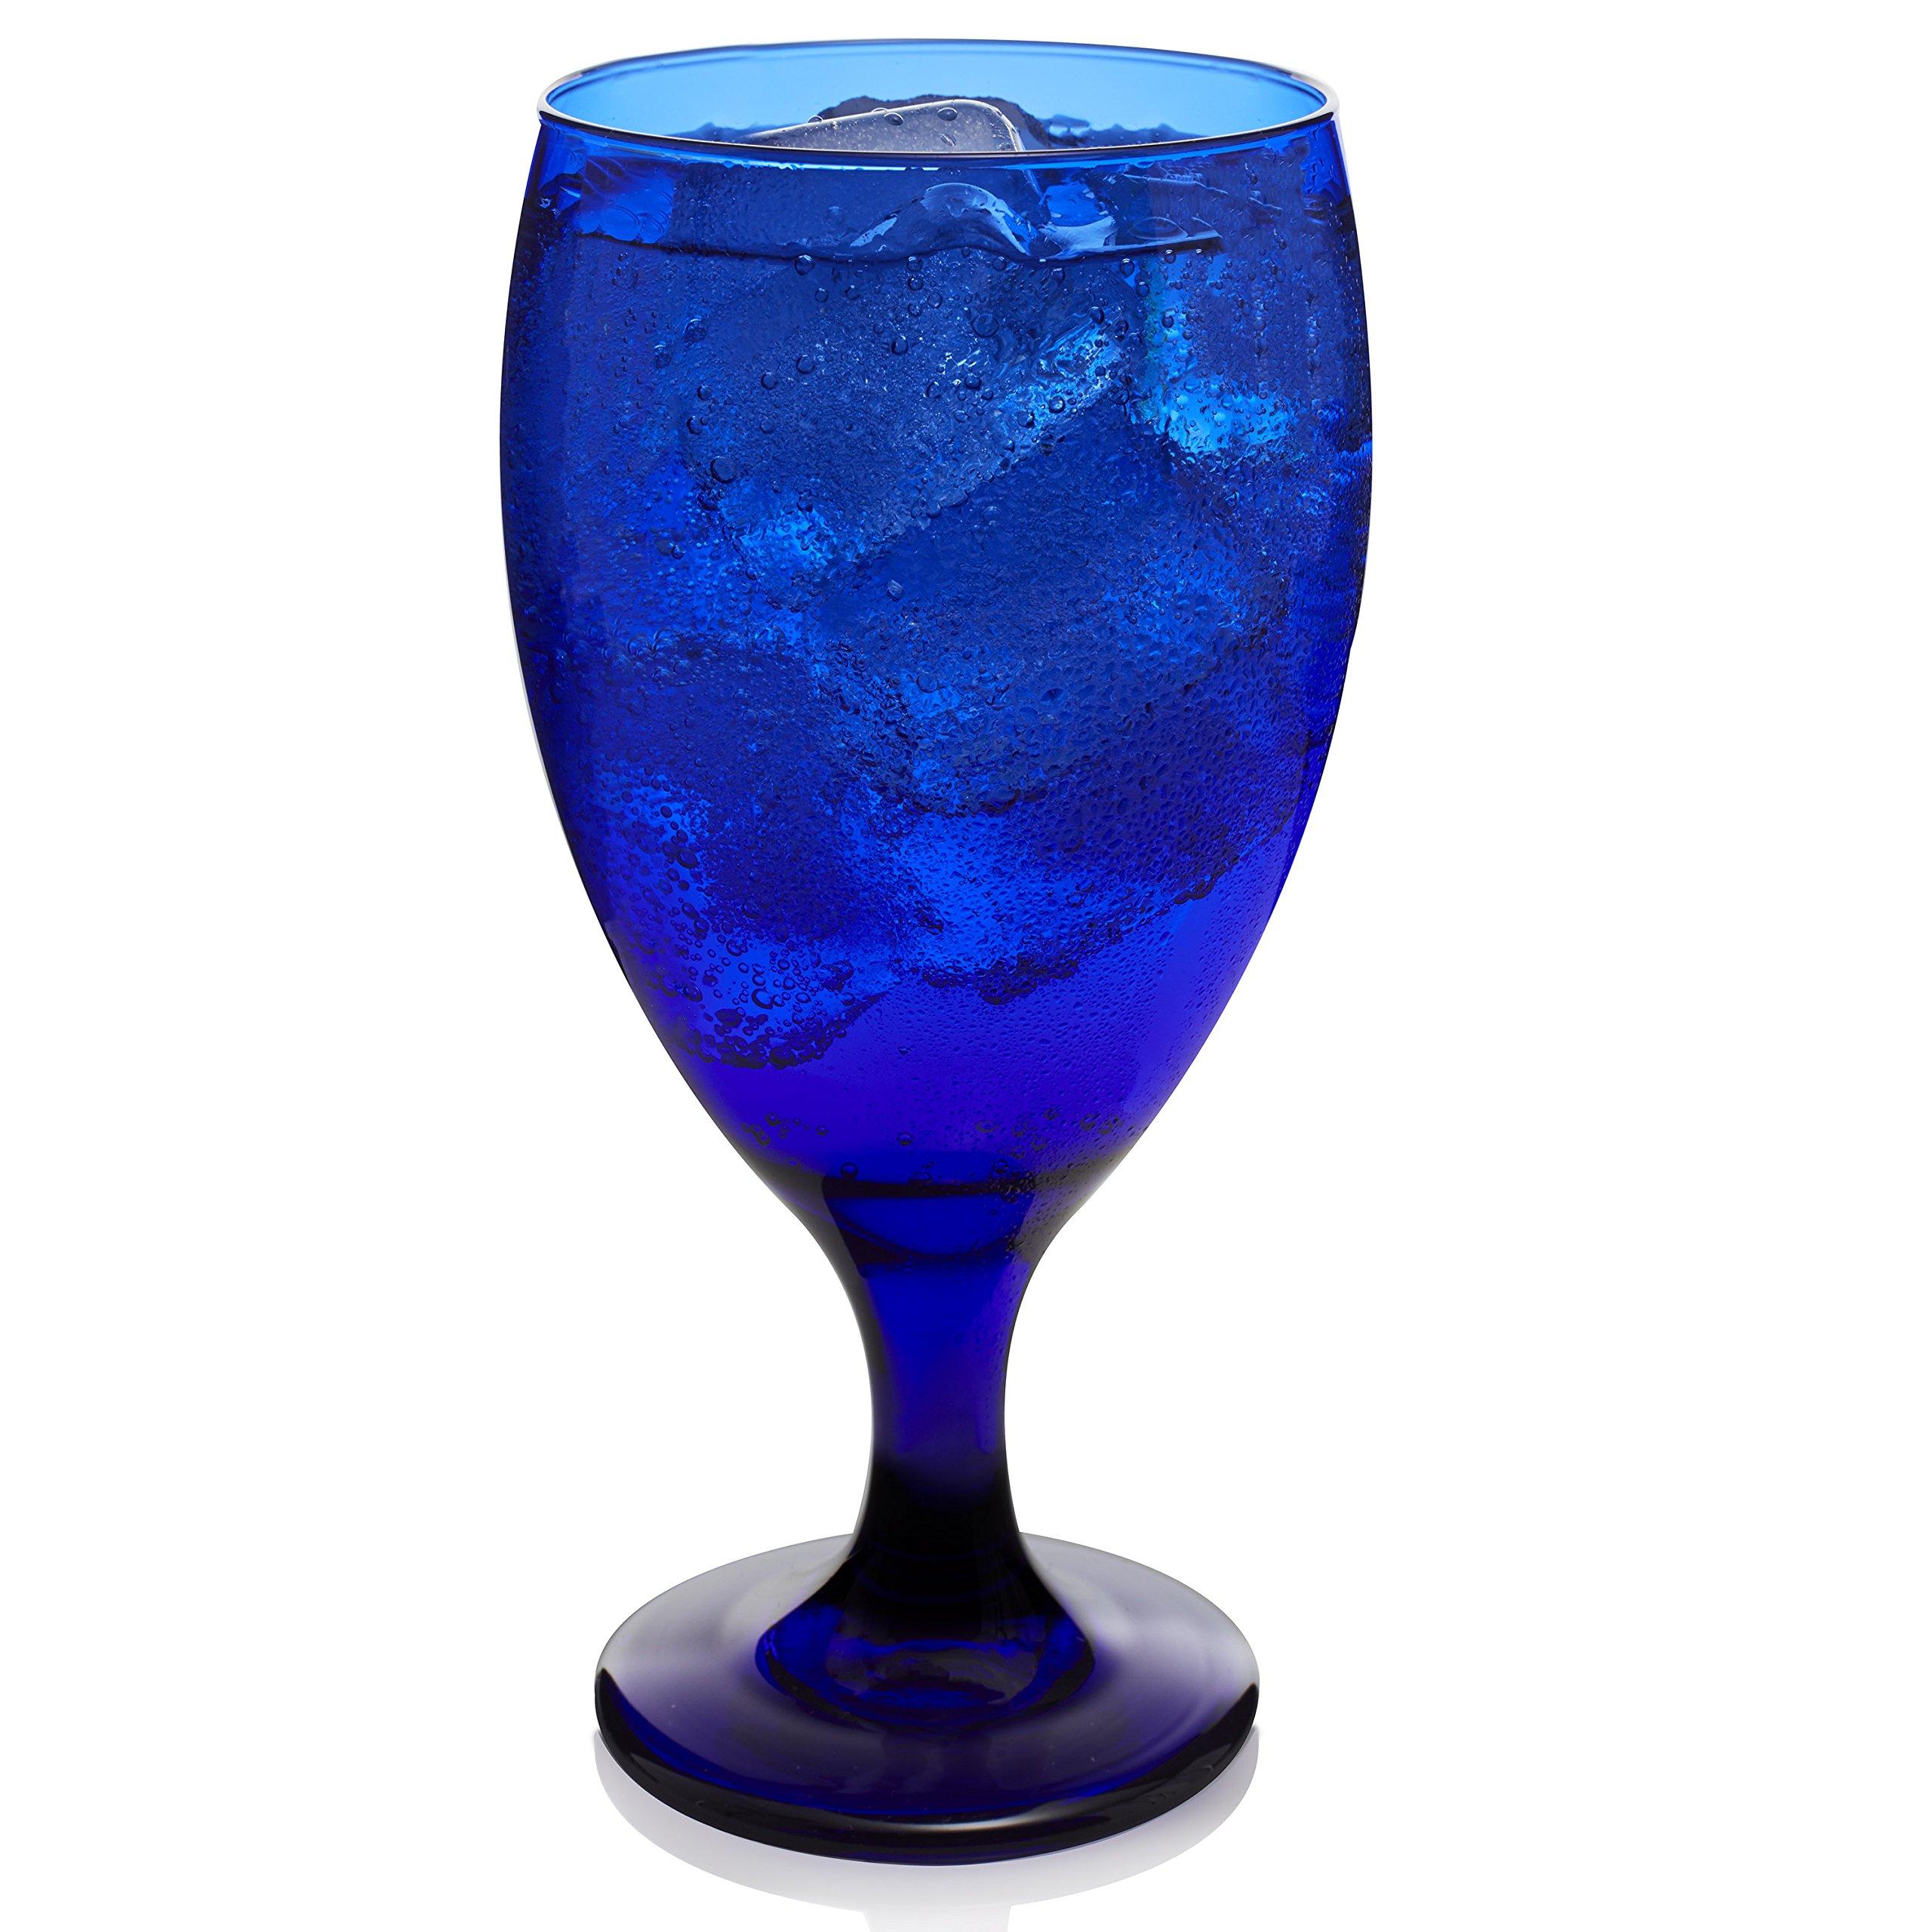 Libbey Premiere Cobalt Iced Tea Glasses, Set of 12 (Frustration Free Packaging)